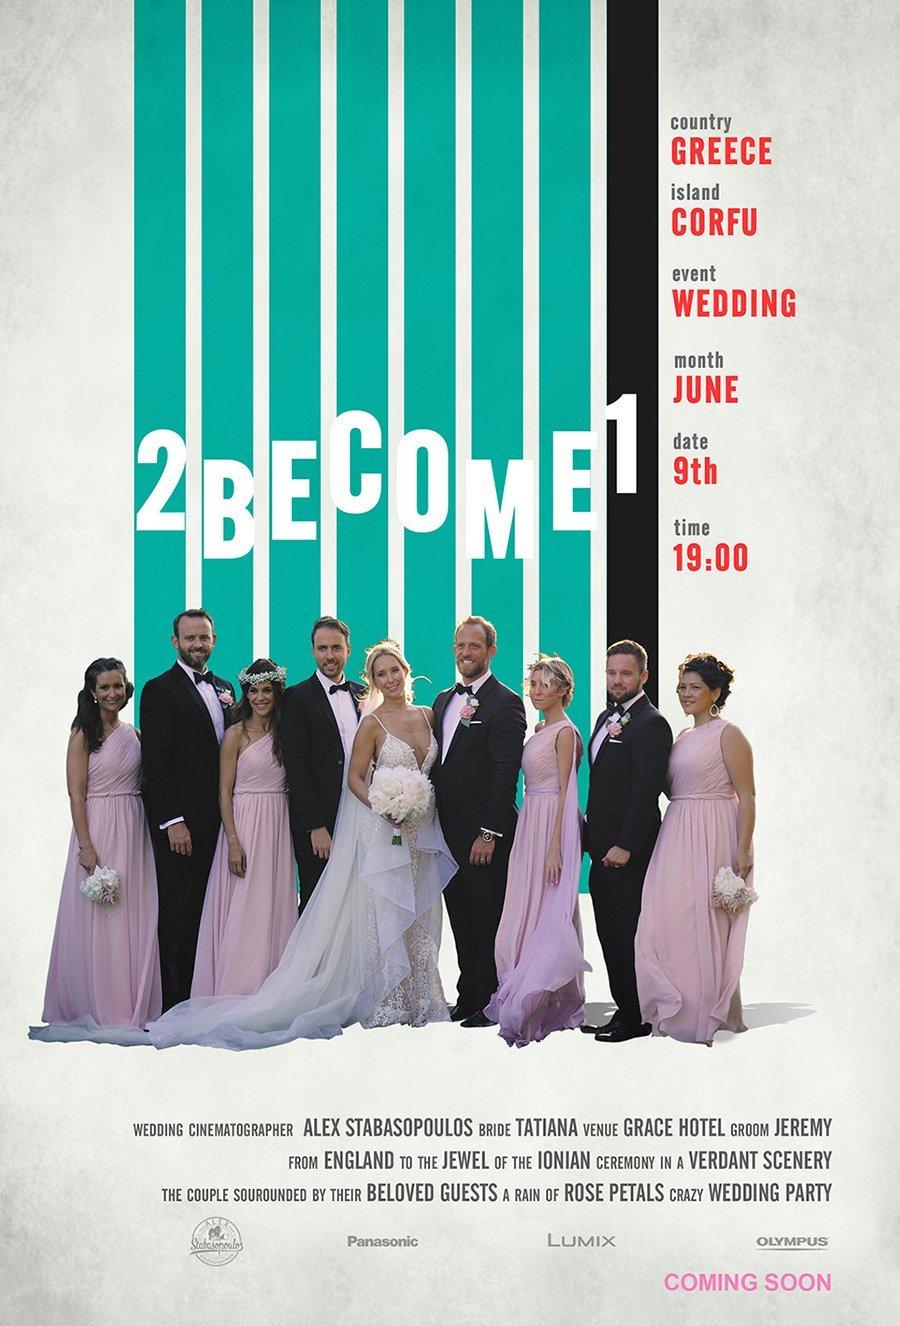 Wedding Video In Corfu (Kerkyra)